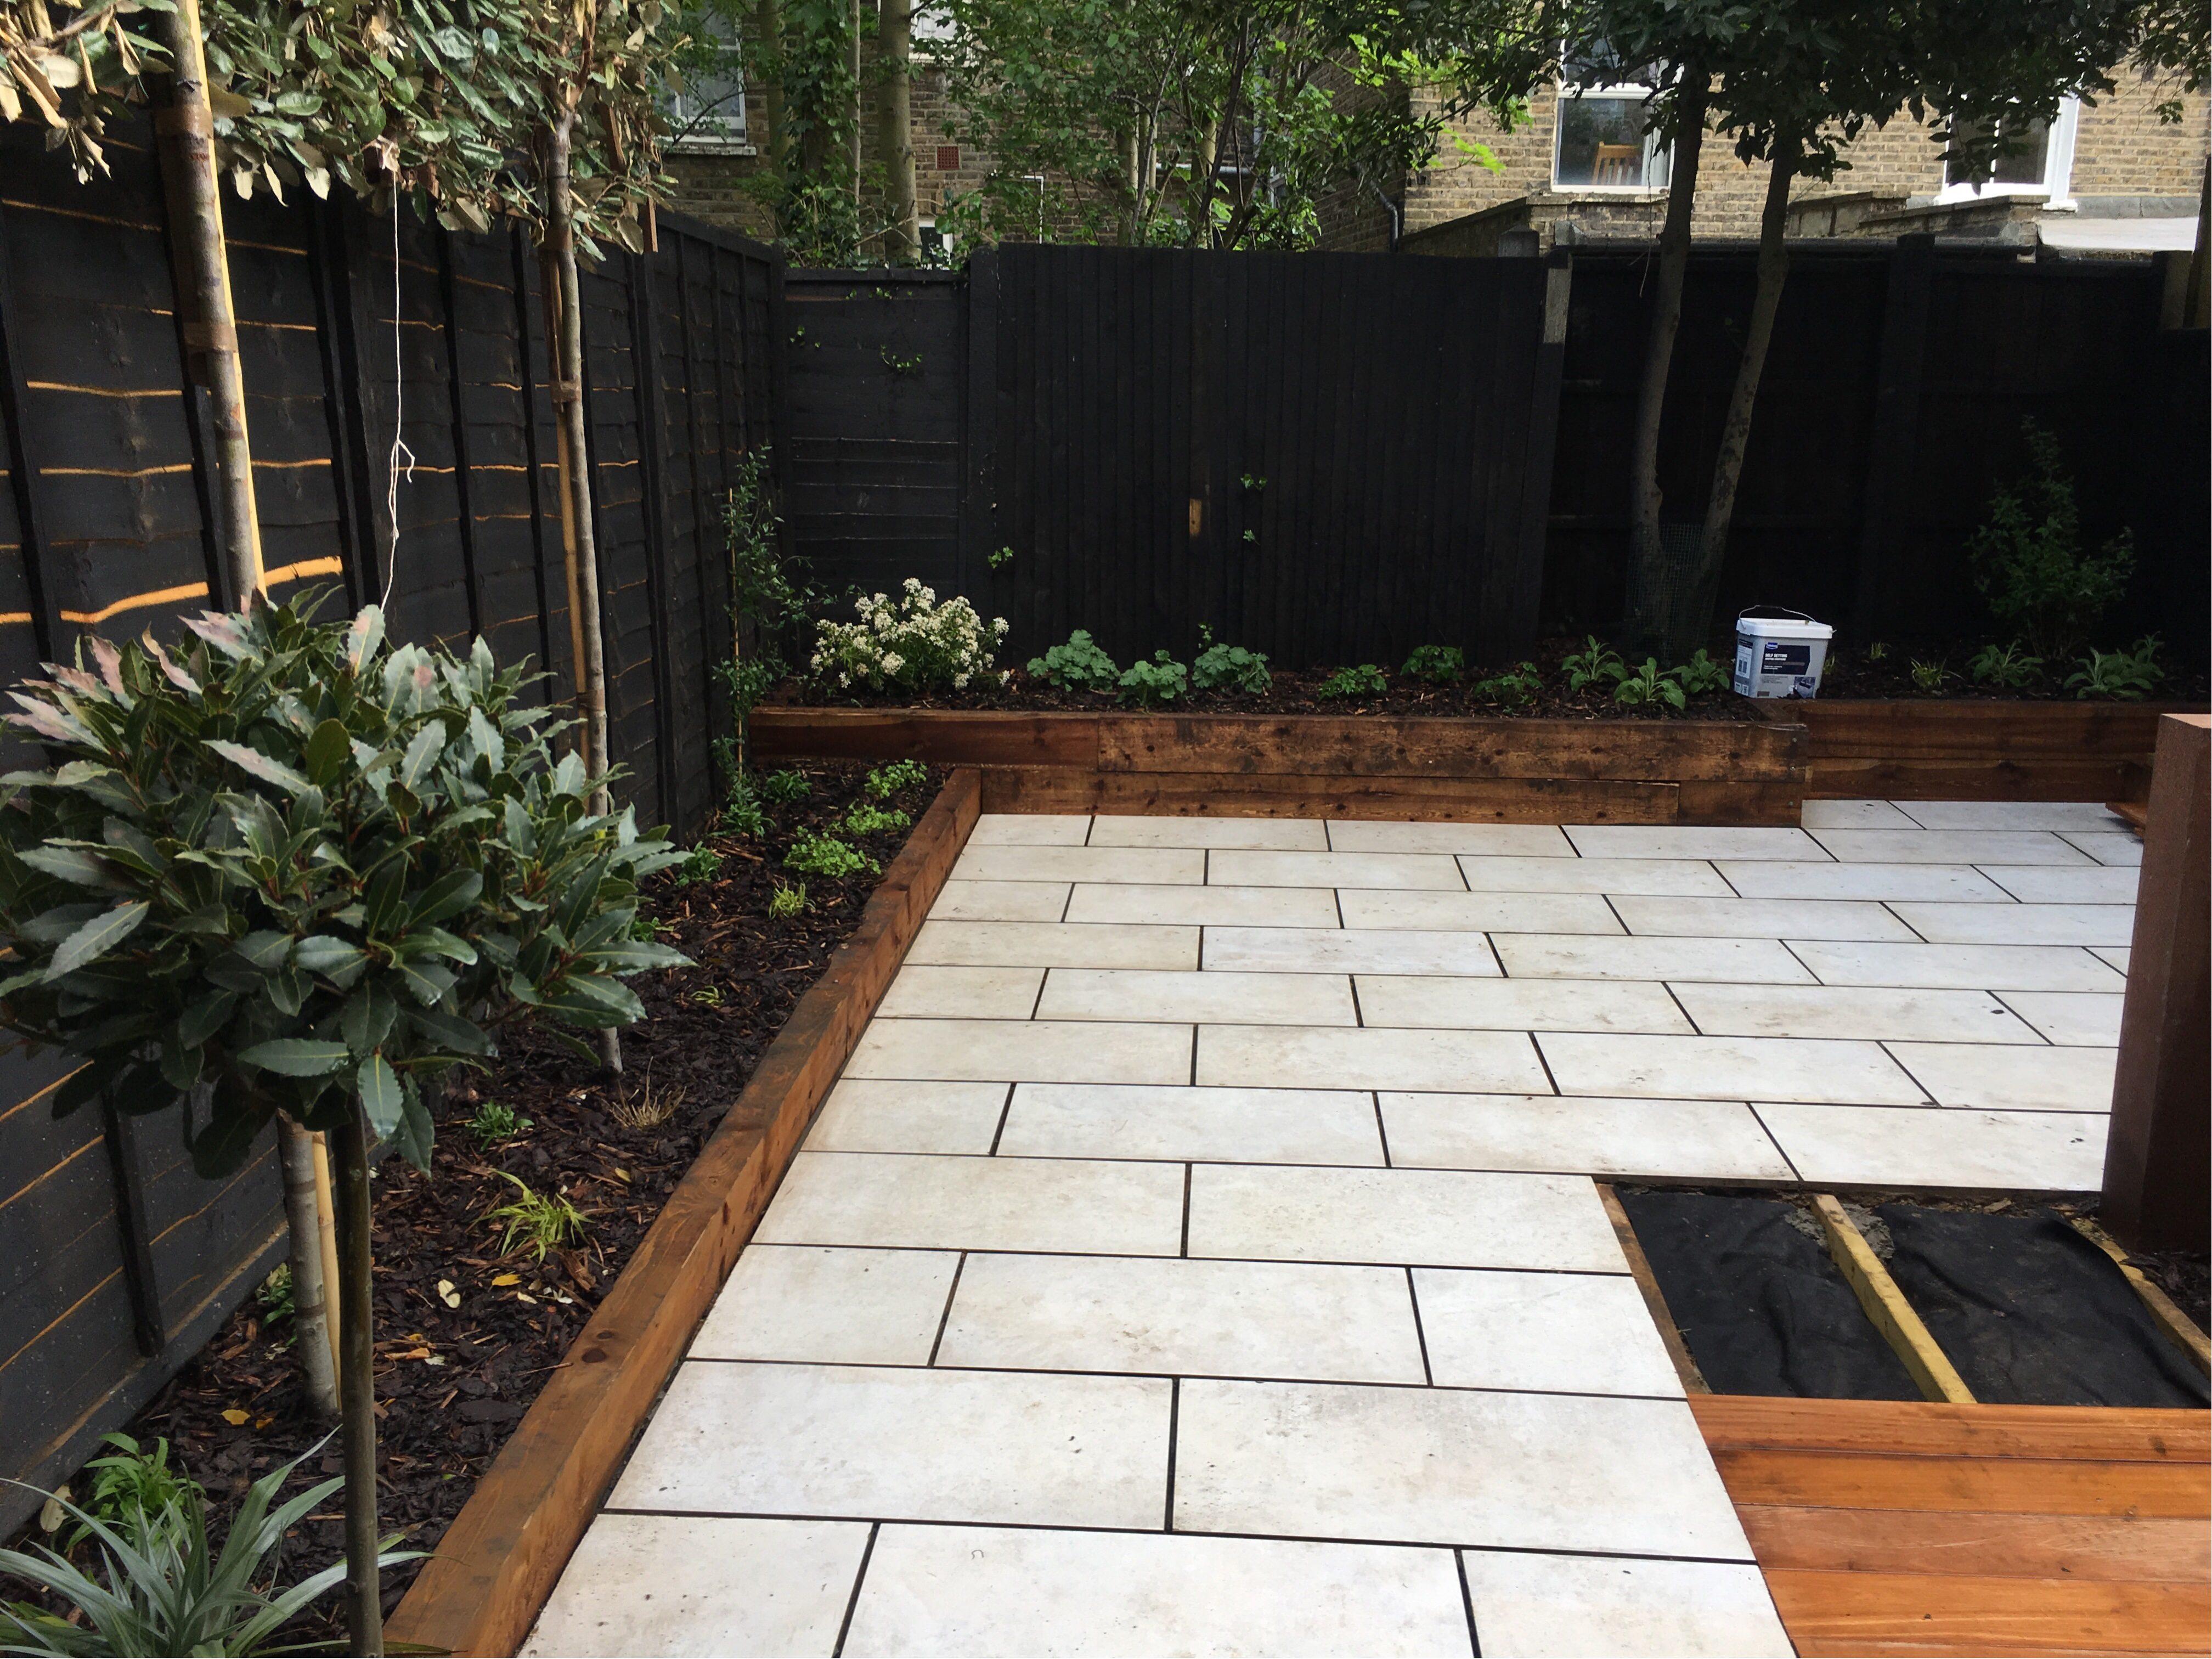 Porcelain as part of your garden paving design